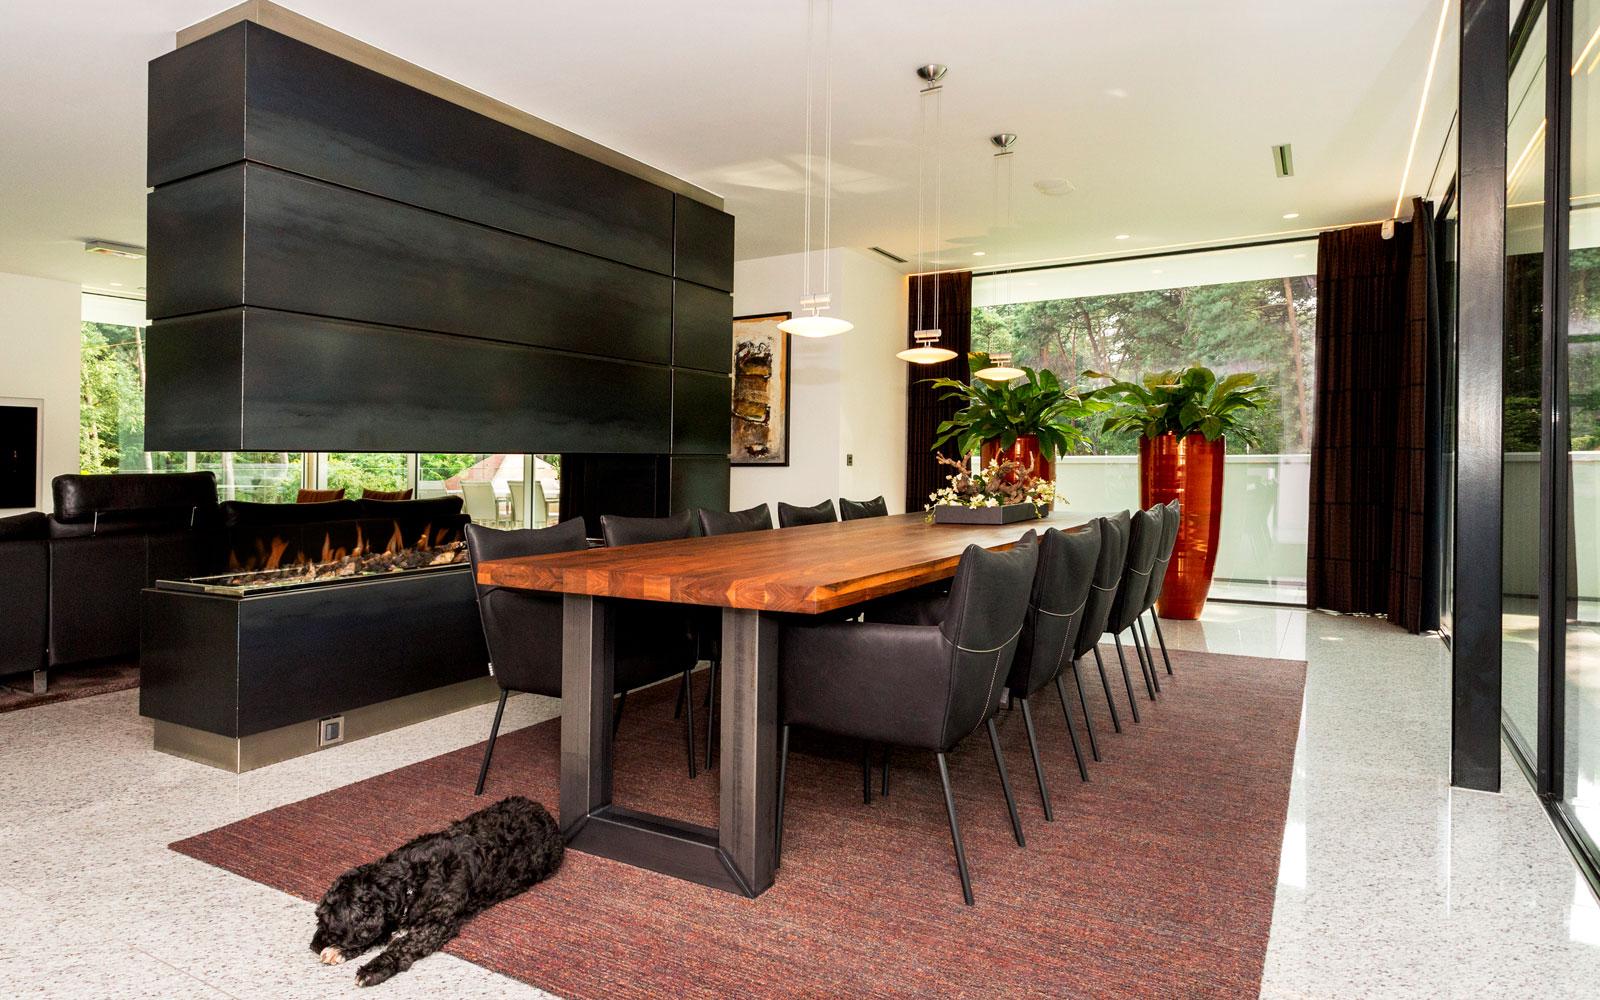 Woonkamer, eettafel, haard, Boley, grote ramen, MHB, minimalistische villa, VLCS Architecten